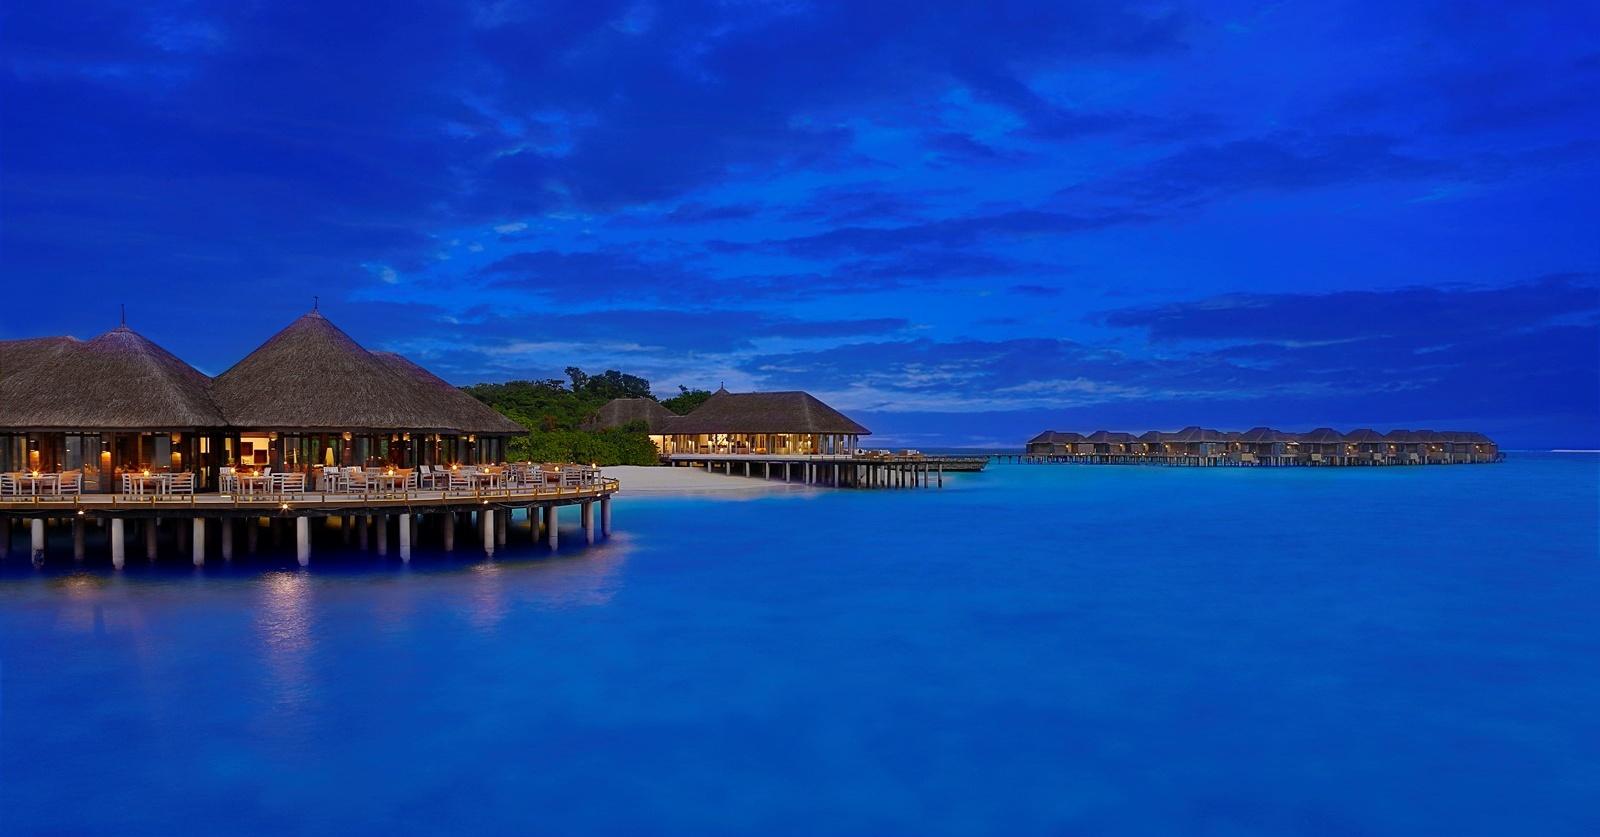 JA-Manafaru-resorts-in-maldives-resorts- - Villas Cropped (1)